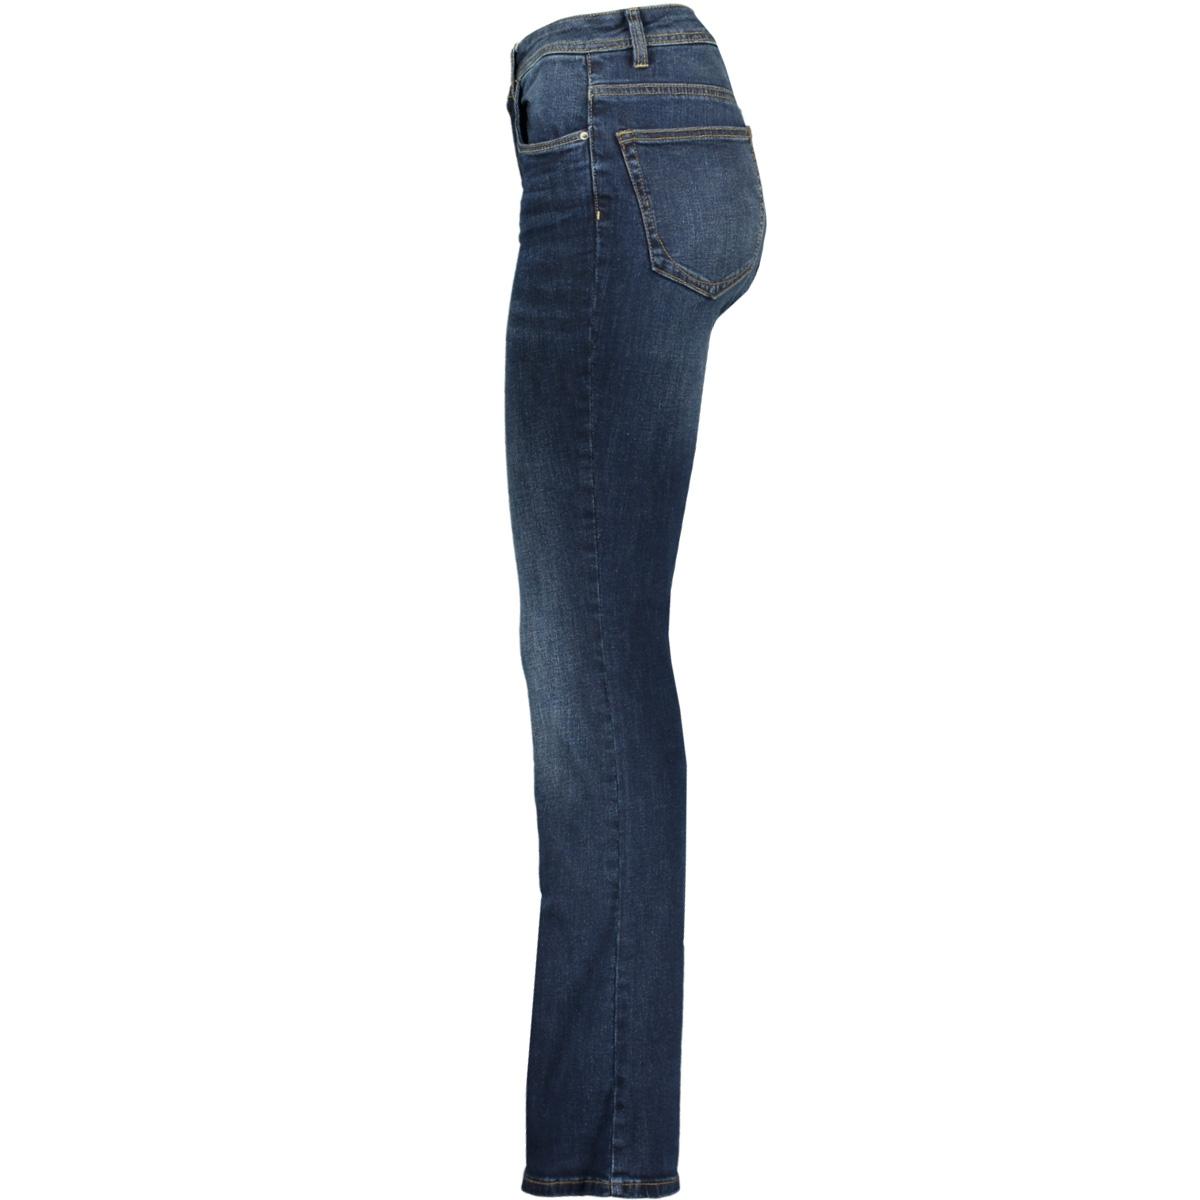 alexa narrowbootcut 1013254xx70 tom tailor jeans 10114